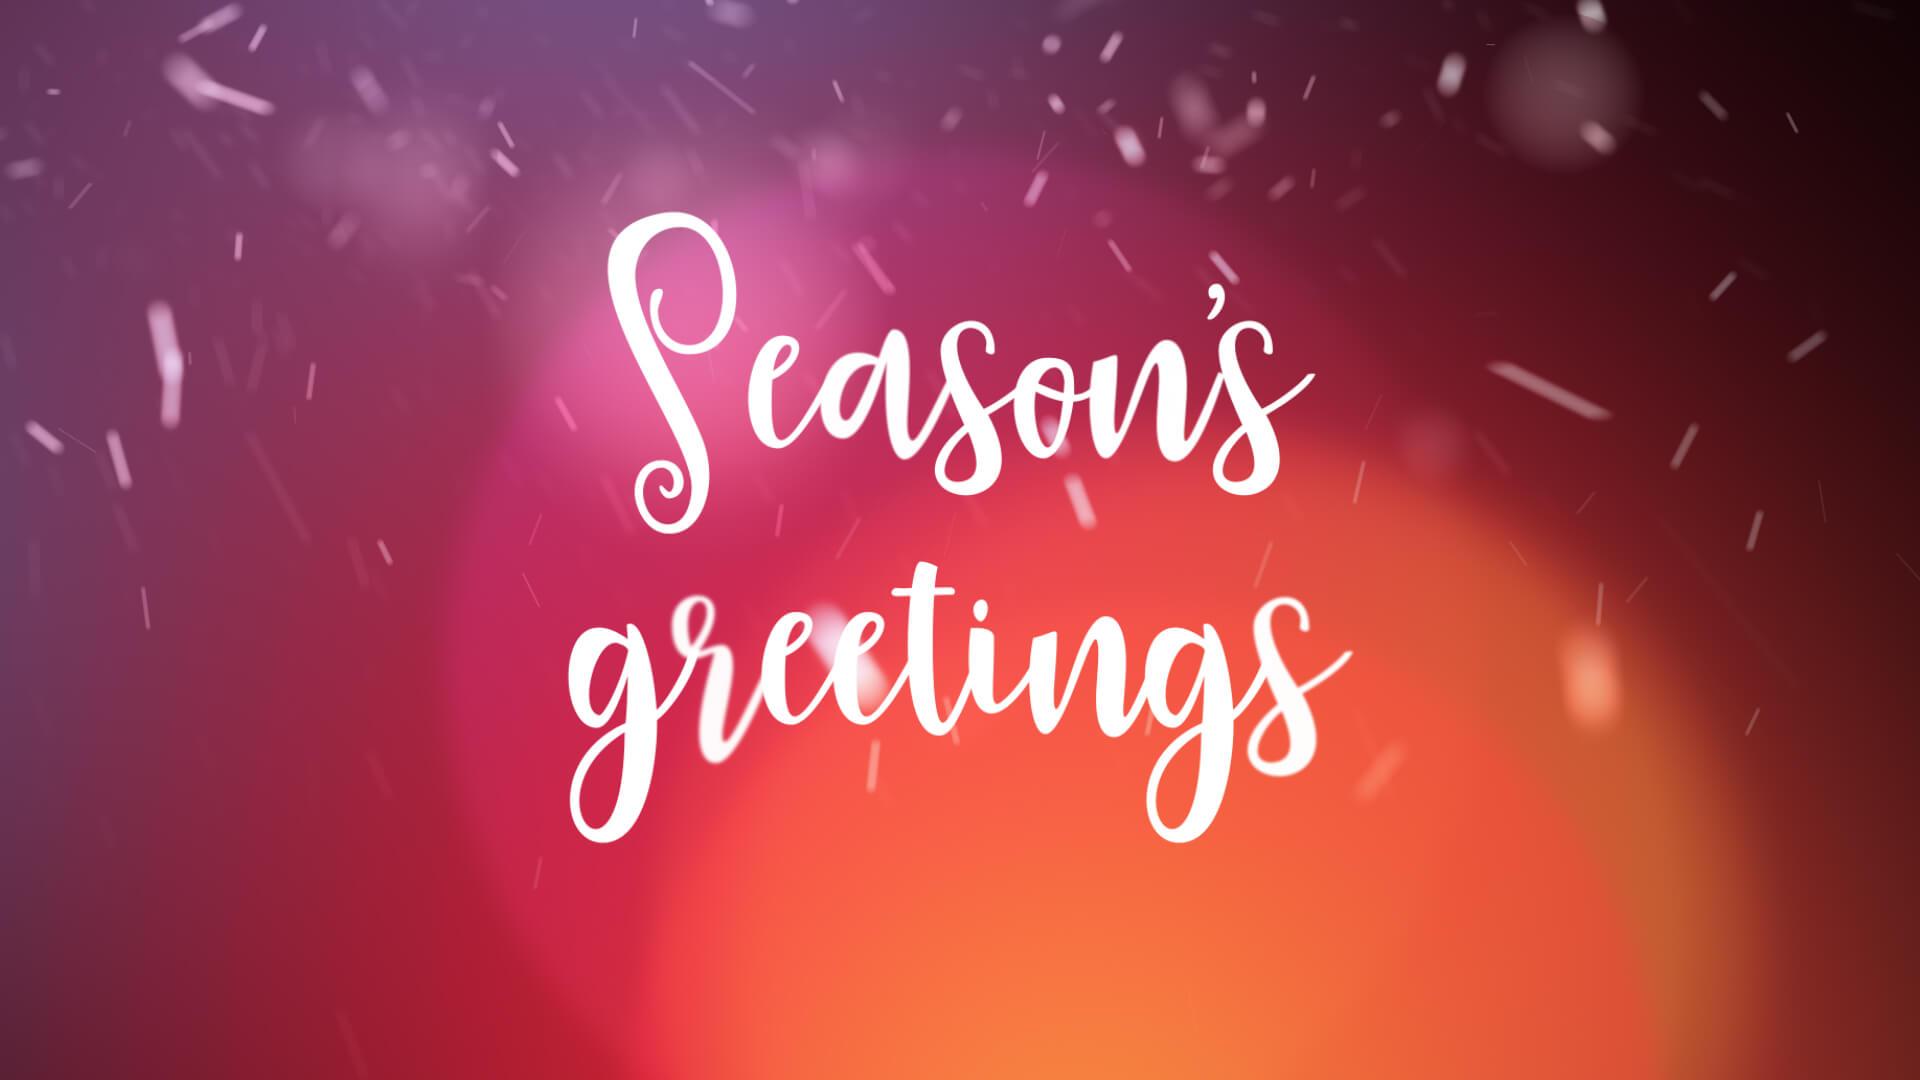 Seasons Greetings Animation Video Still